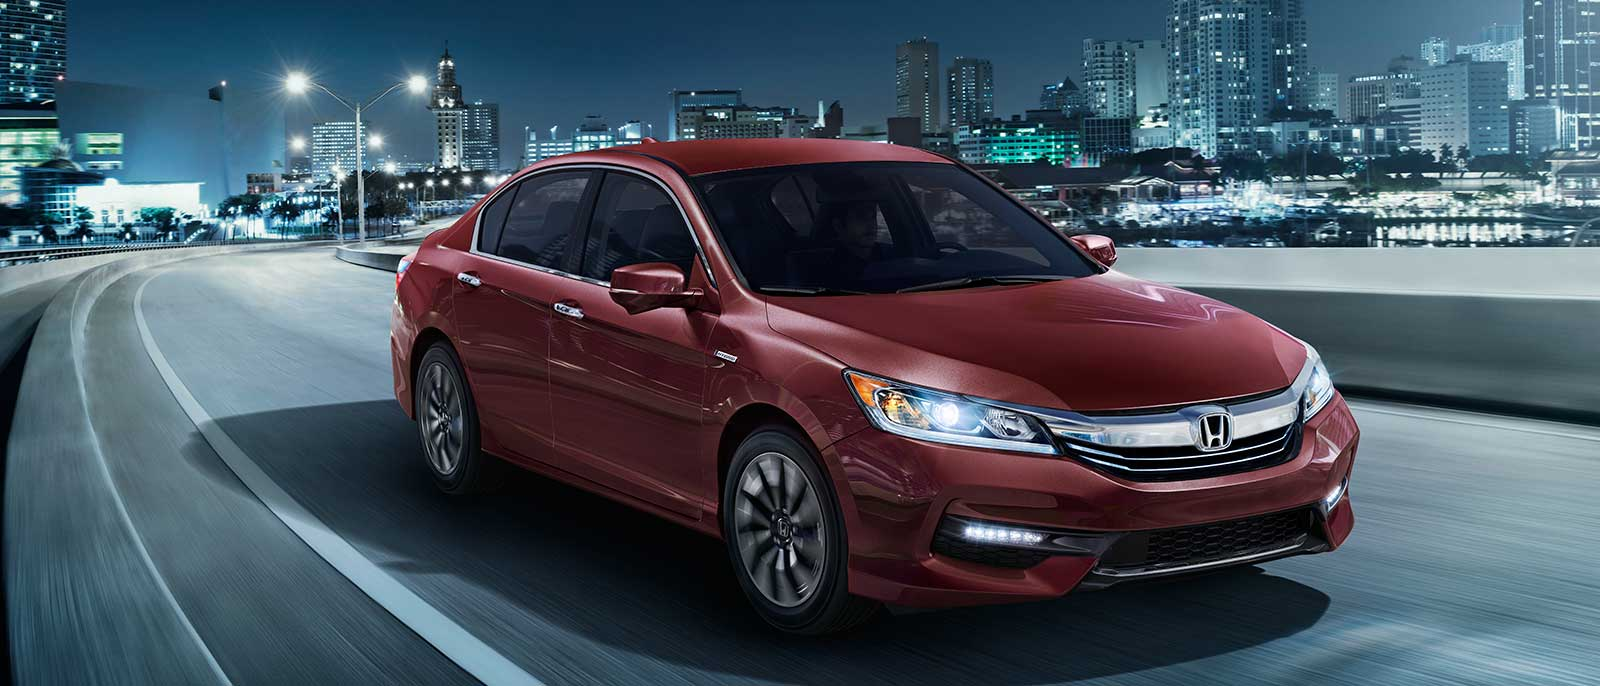 2017 Honda Accord Hybrid city driving